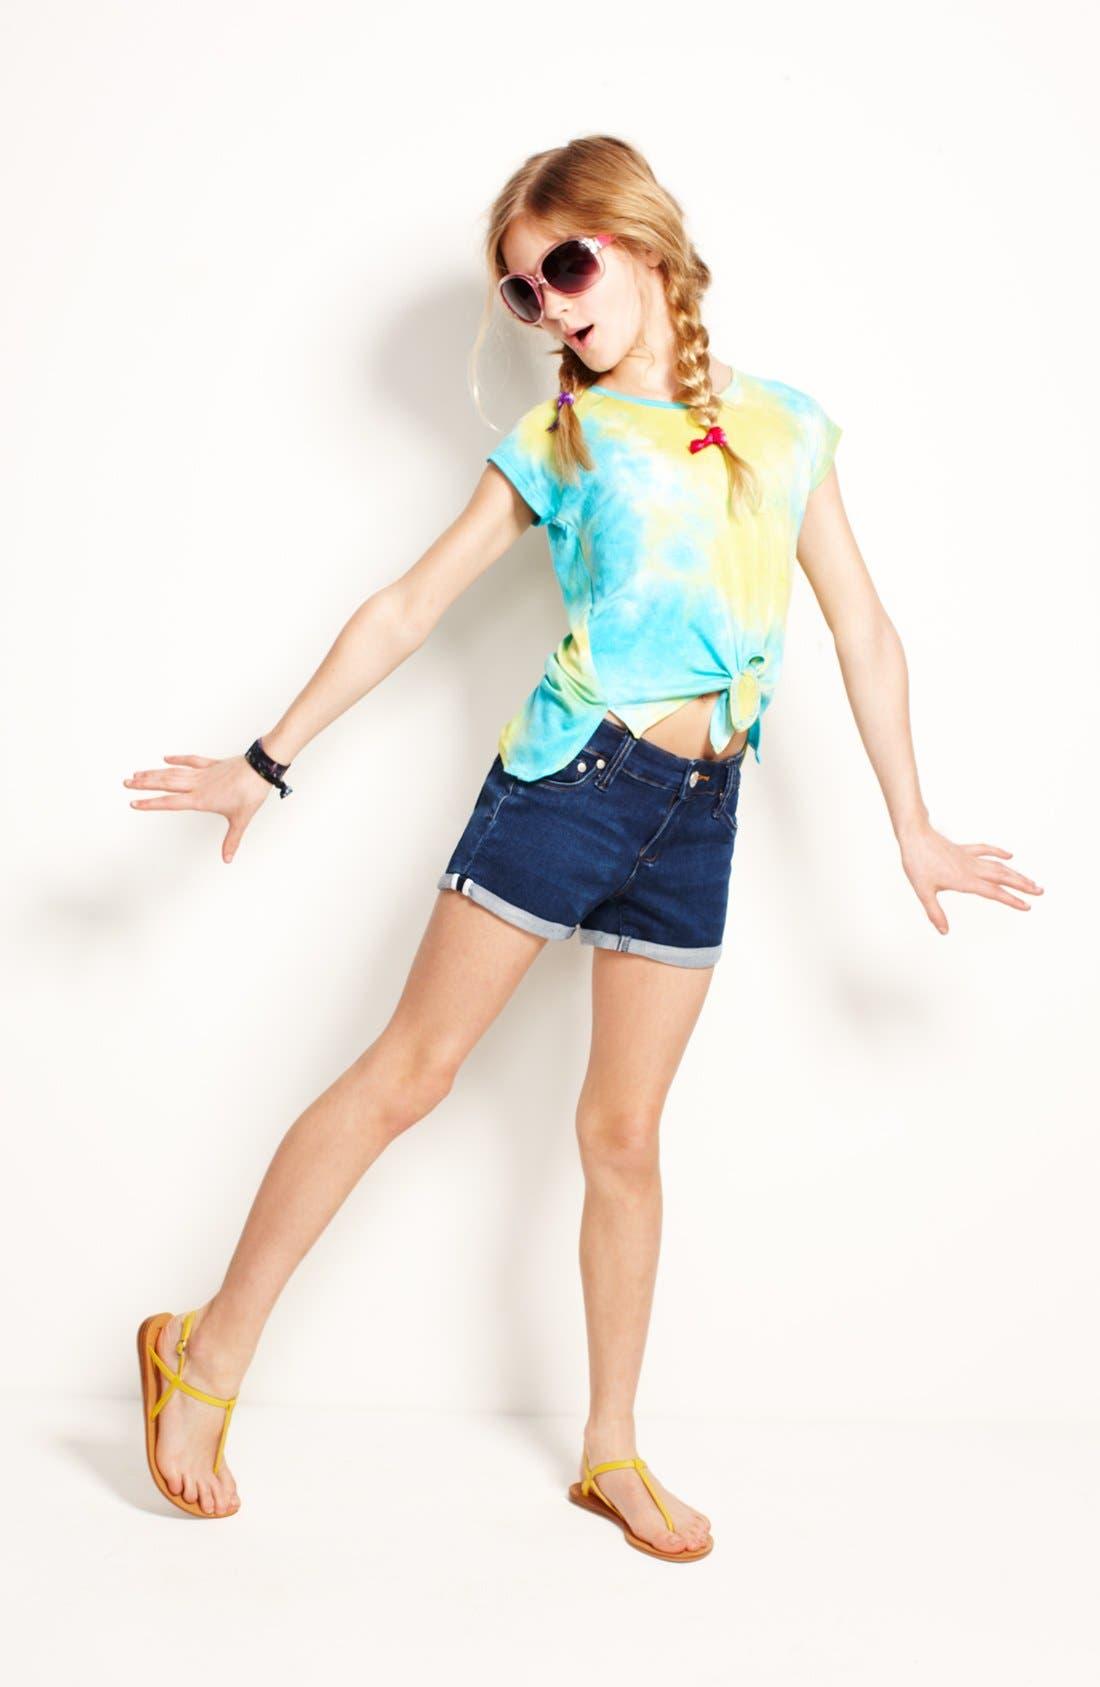 Main Image - Mia Chica Top & Tractr Shorts (Big Girls)